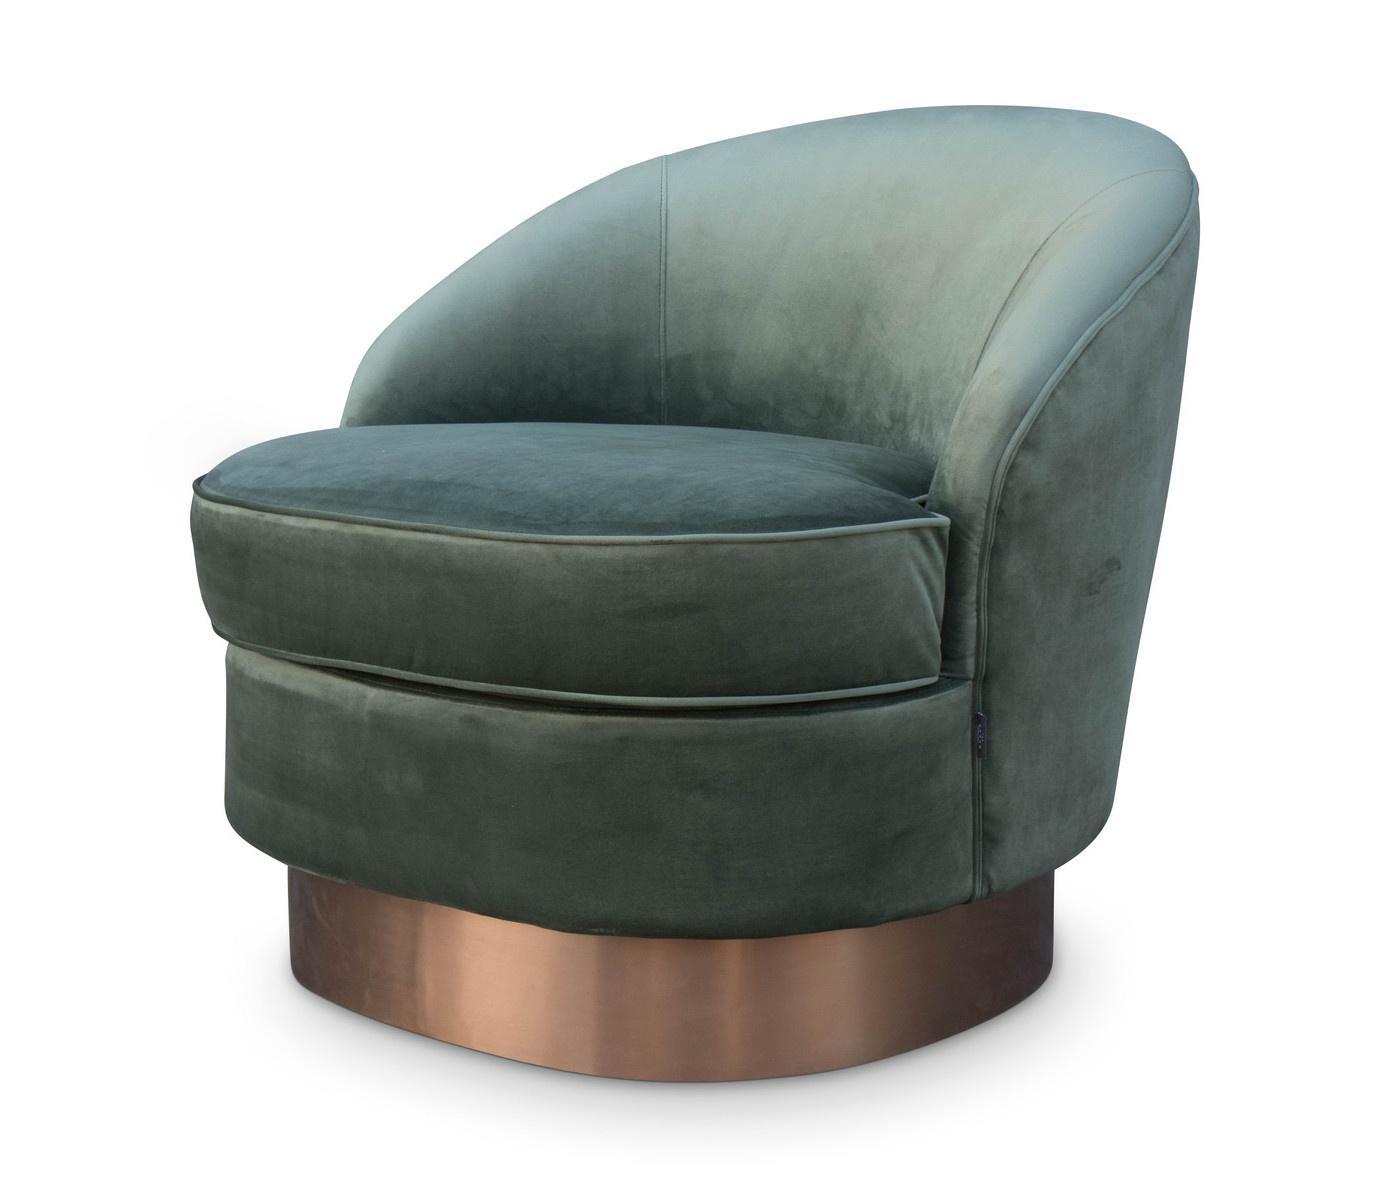 GIARDION Arm Chair Forest Green velvet-1